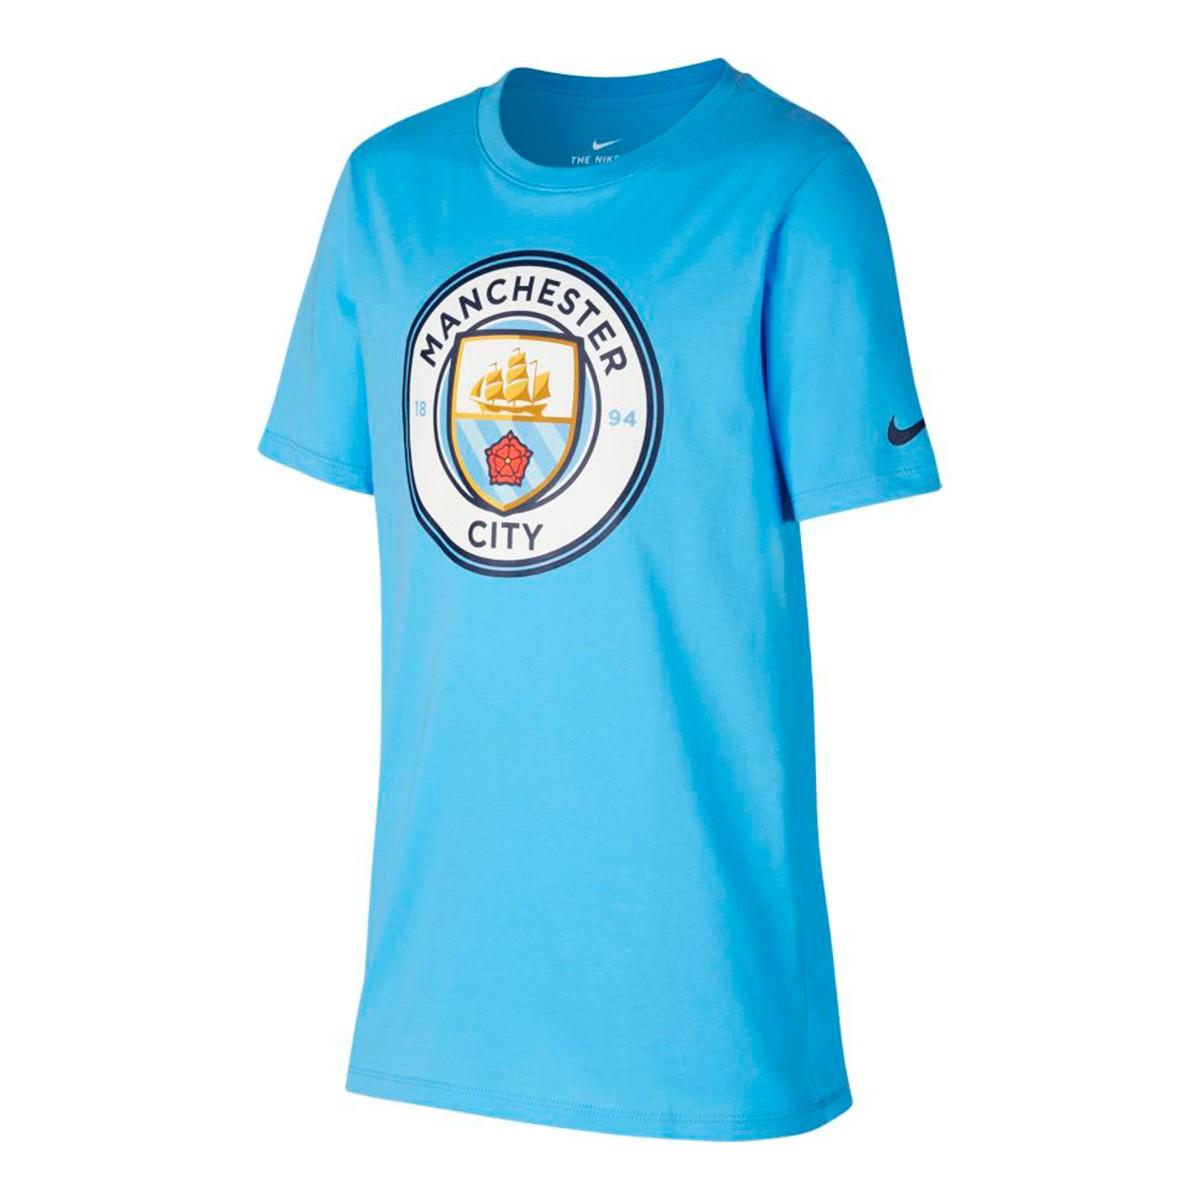 4372796c4e44e Jersey Nike Kids Manchester City FC 2018-2019 Field blue - Football ...